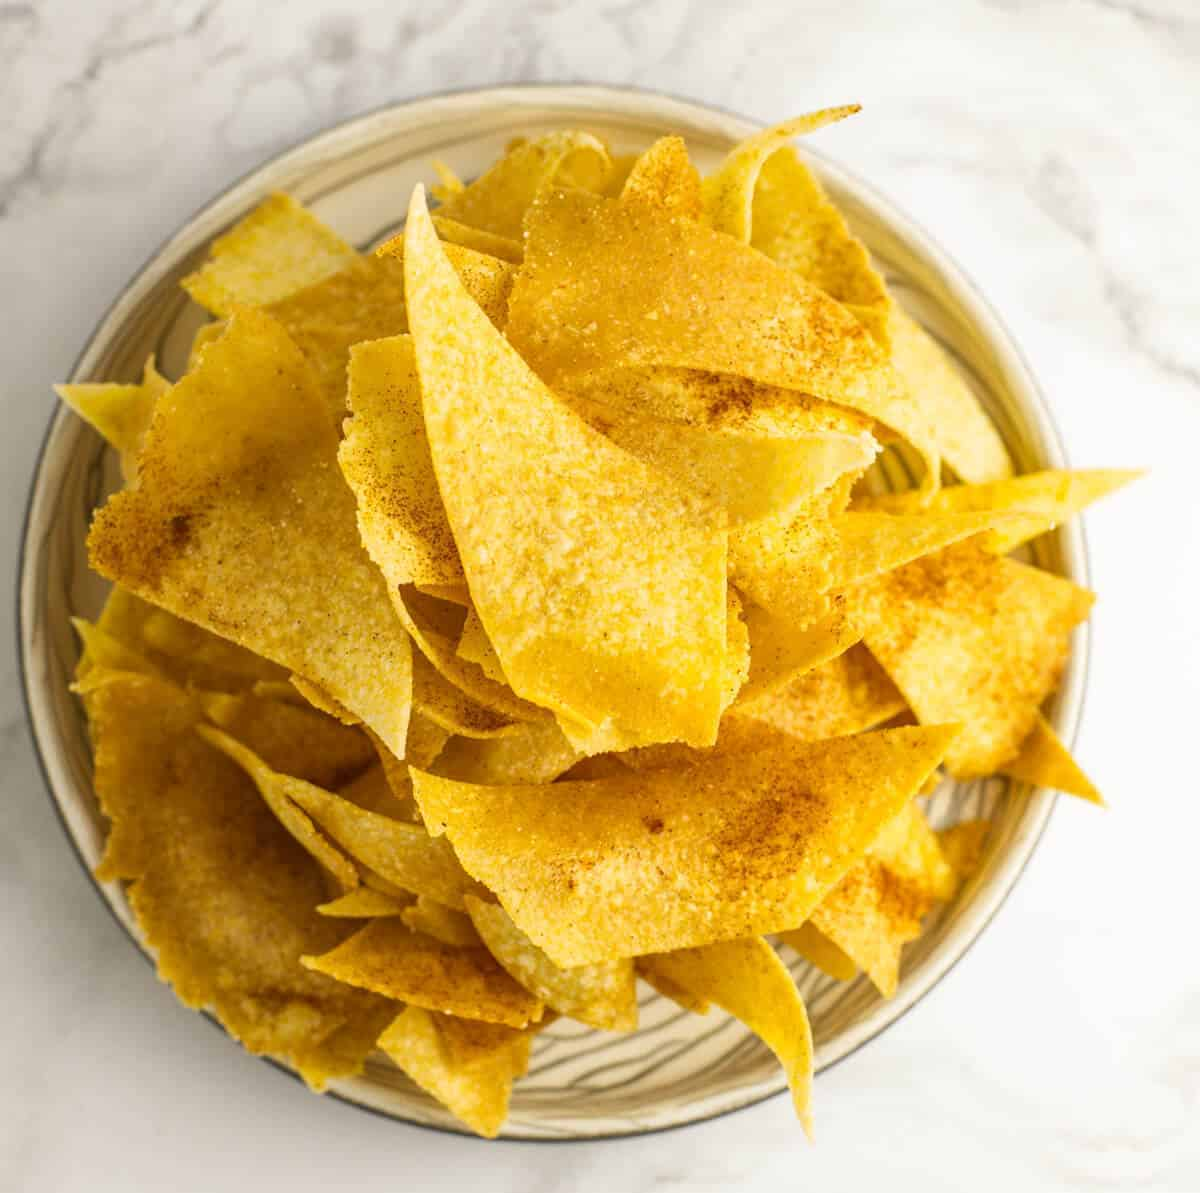 corn tortilla chips on a beige plate